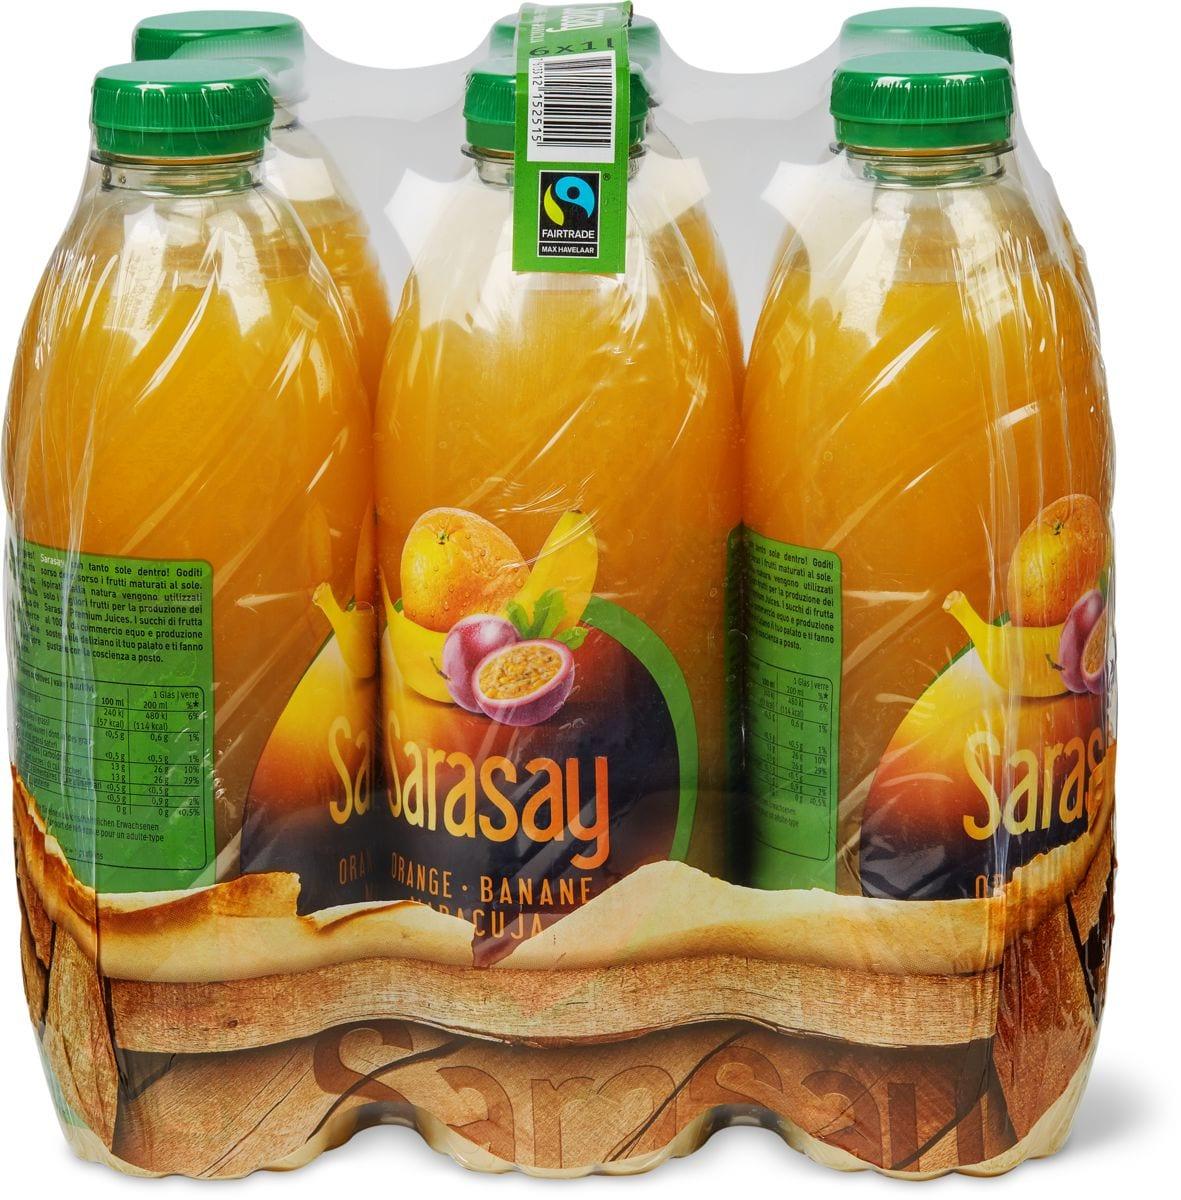 Sarasay Max Havelaar Orange-banane